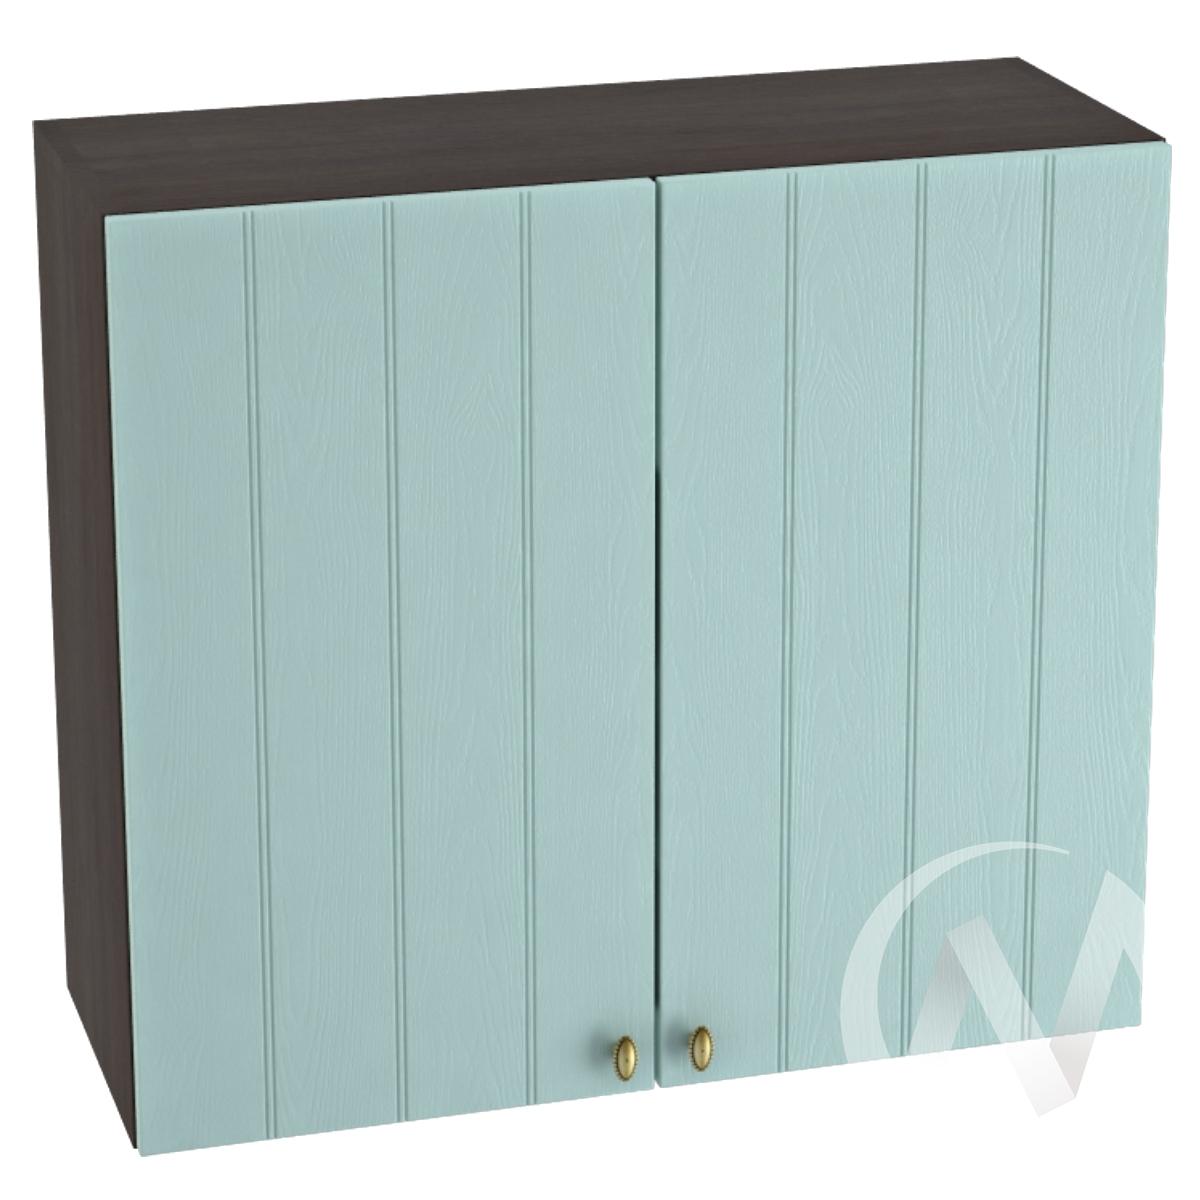 "Кухня ""Прованс"": Шкаф верхний 800, ШВ 800 (голубой/корпус венге)"